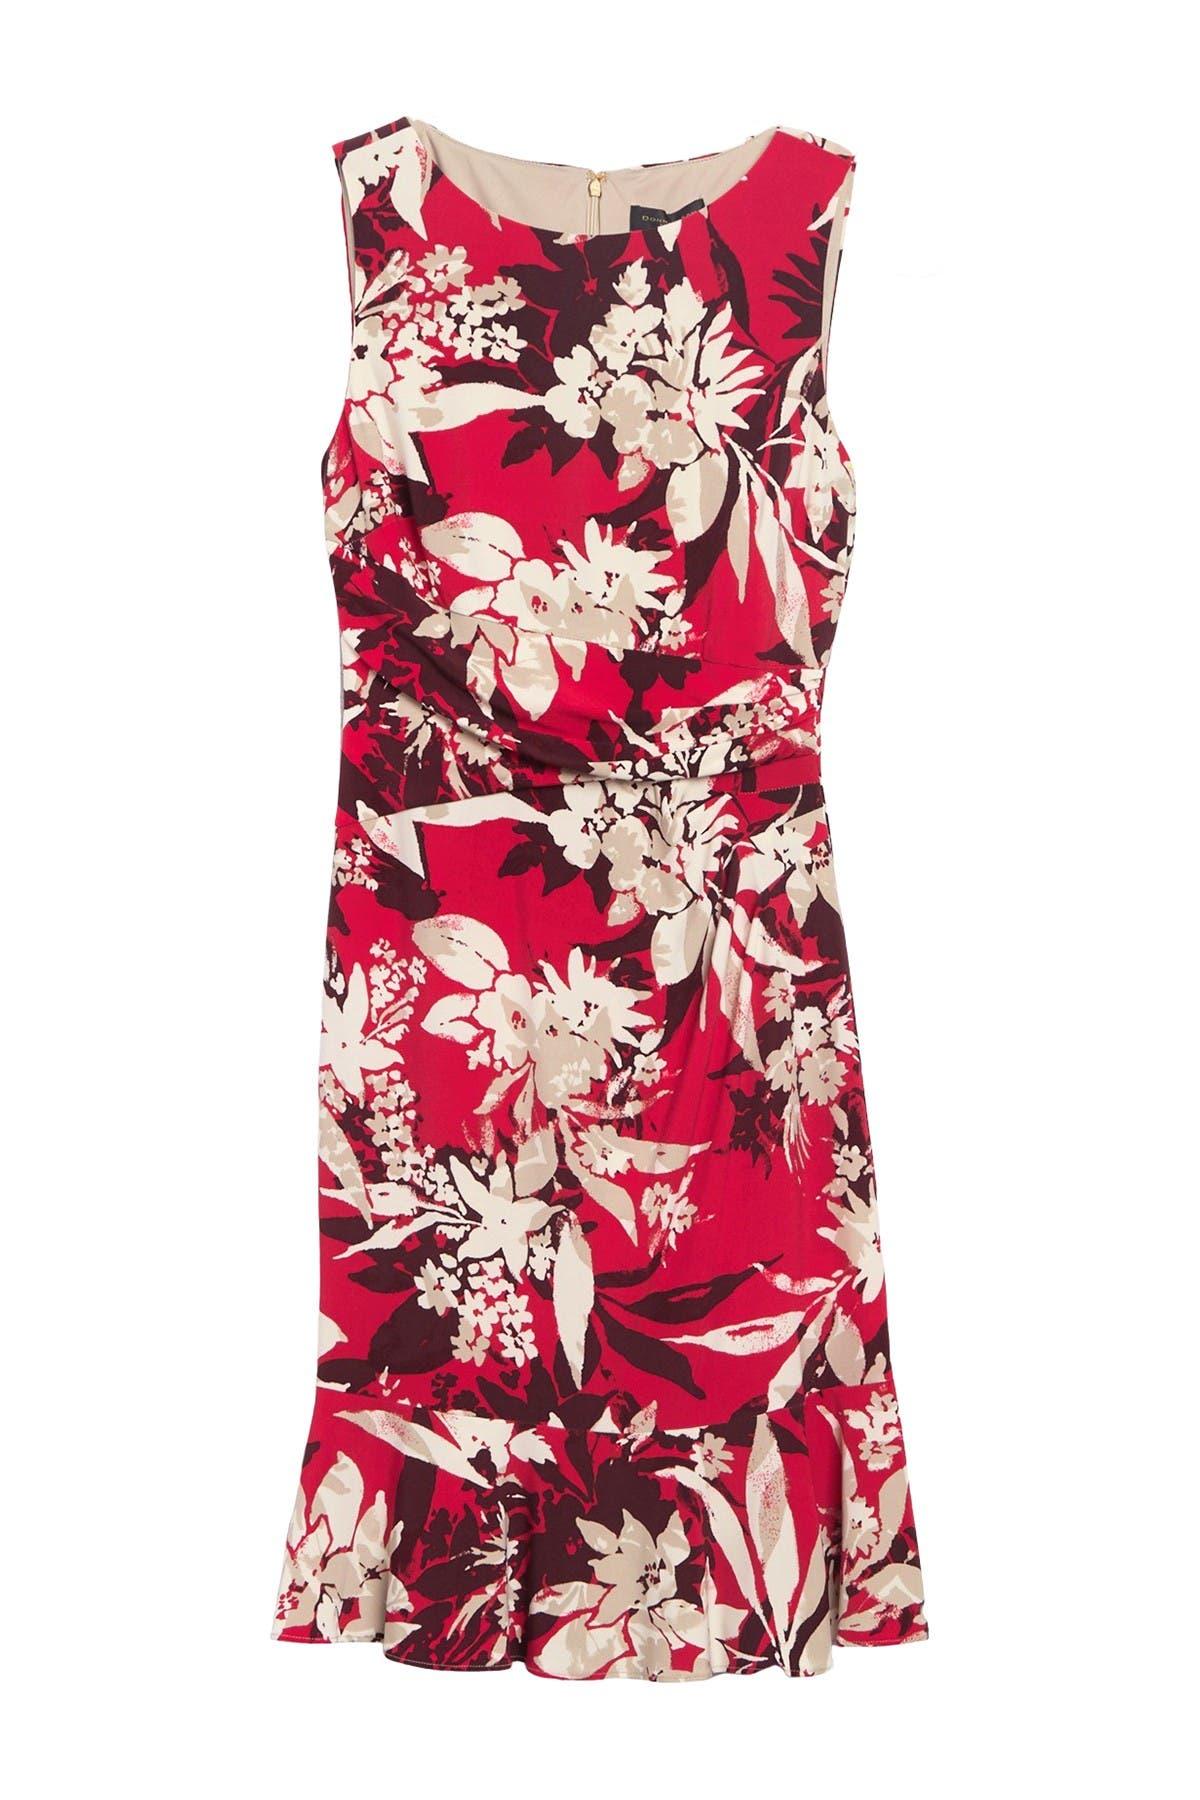 Image of DKNY Patterned Boatneck Sheath Dress